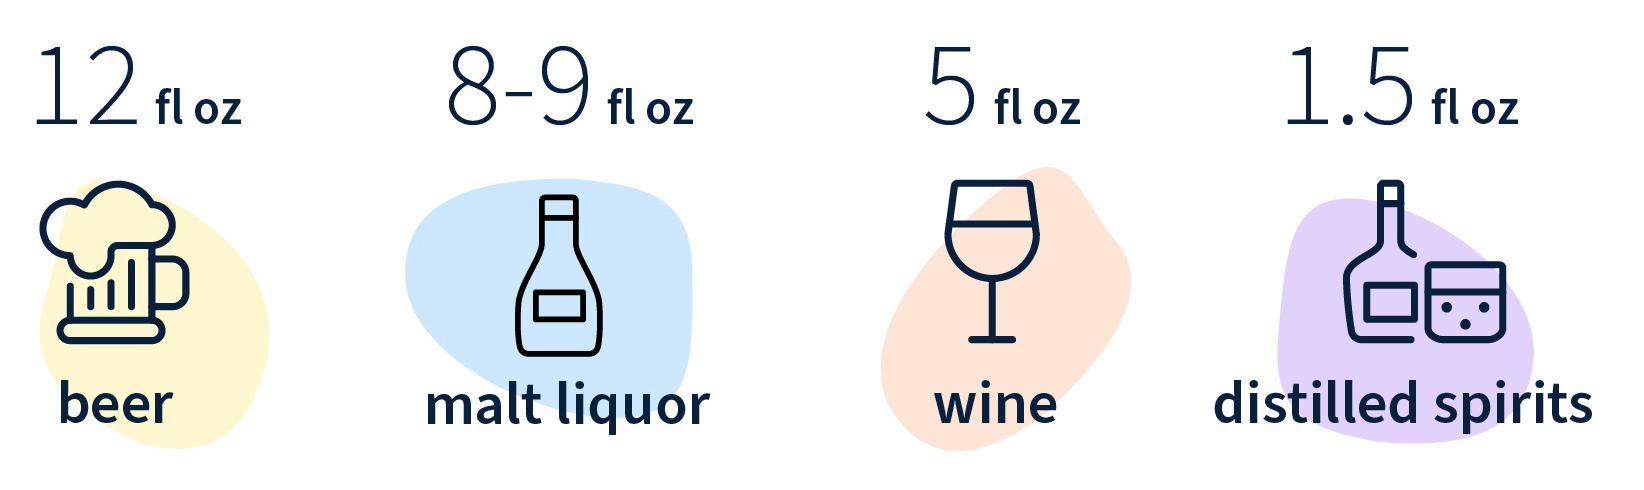 NIAAA standard drink size chart